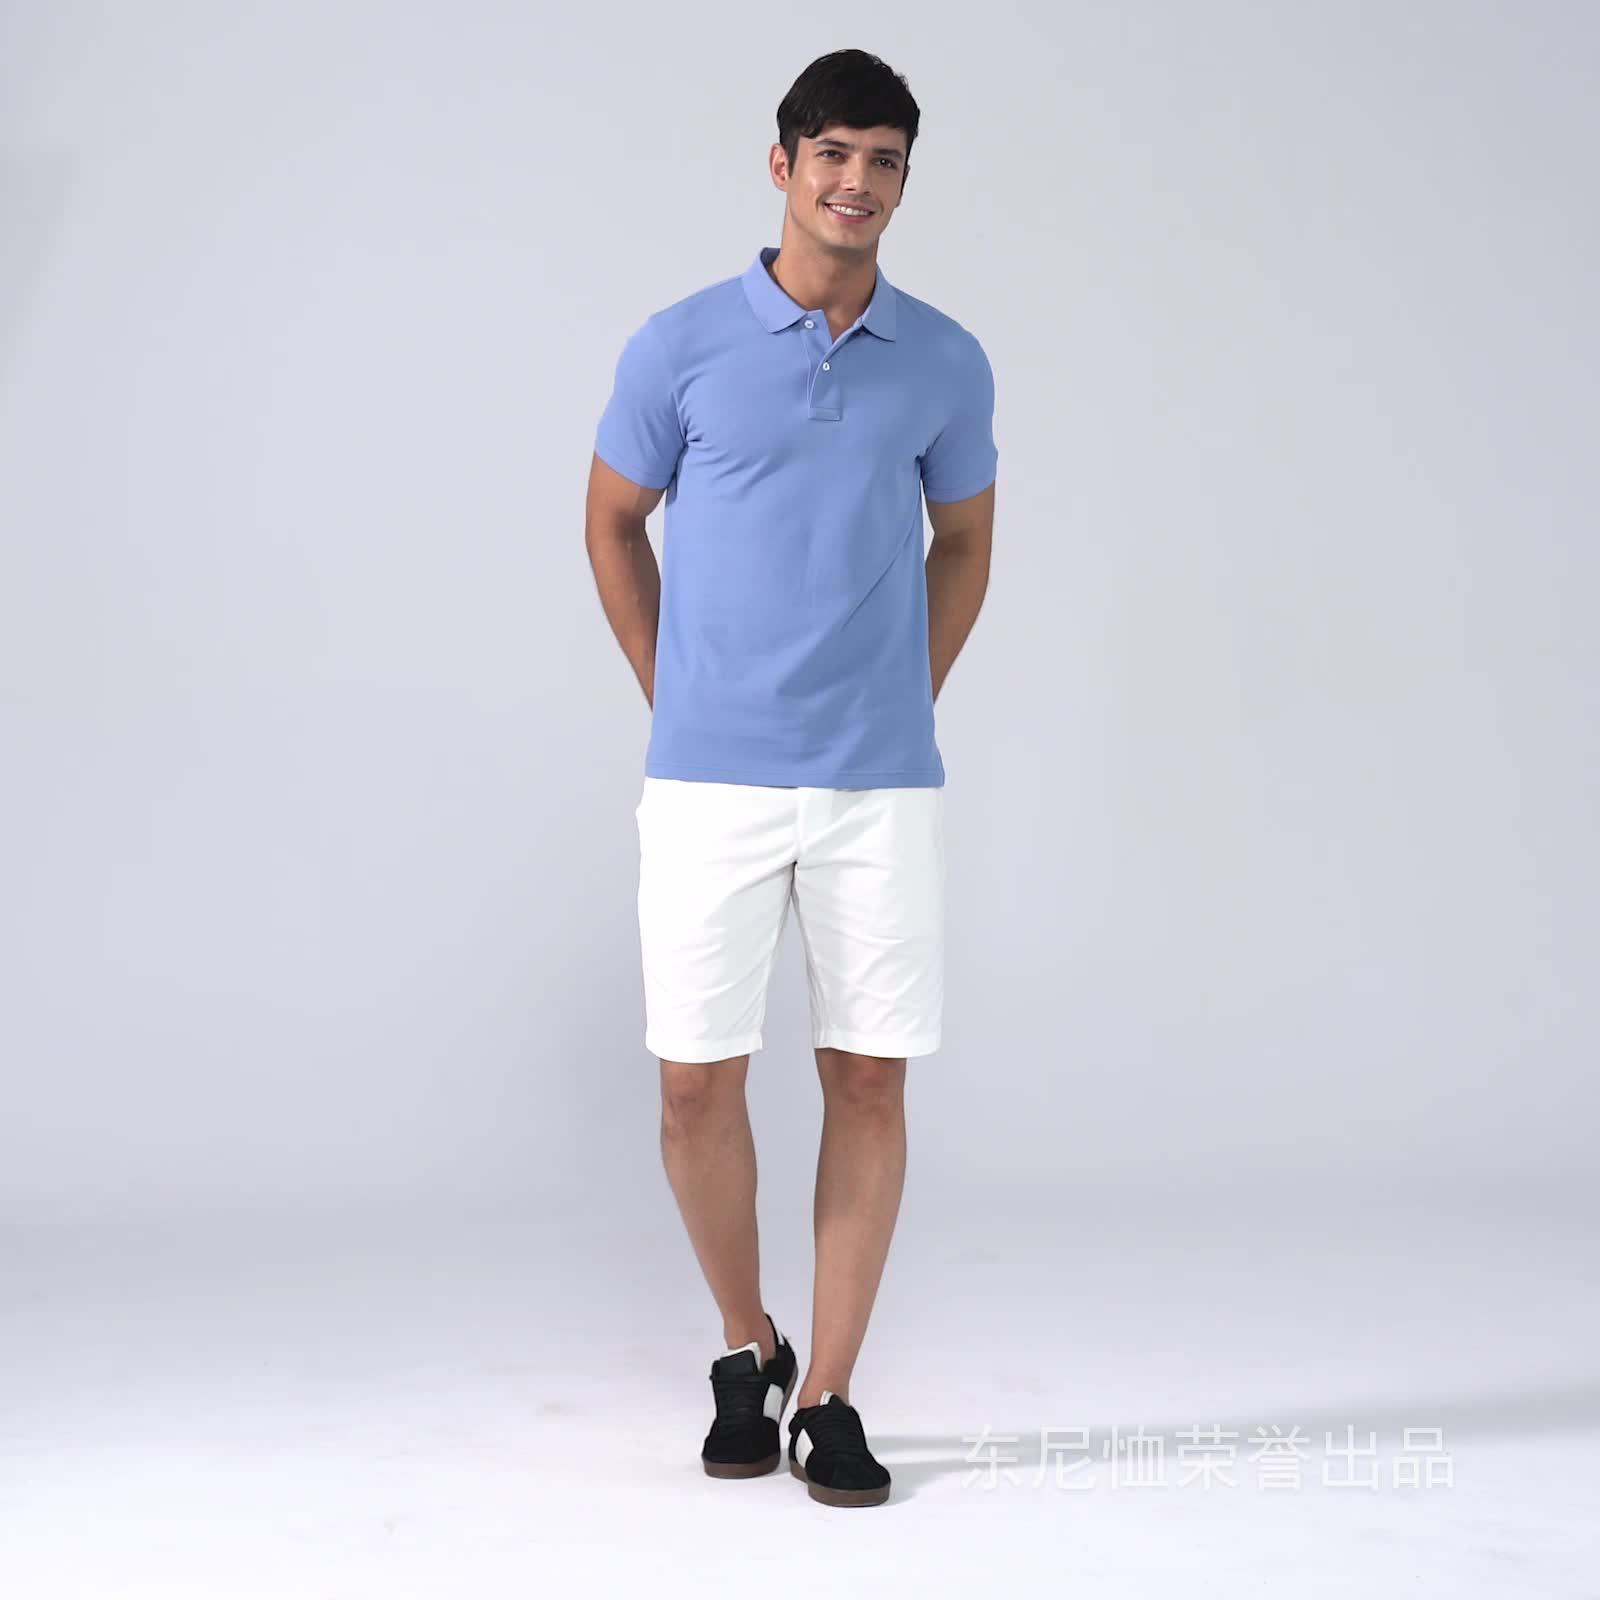 Großhandel Hohe qualität polo shirts, polo-shirt custom bestickte Sommer männer polo t shirts 100% mercerisierter baumwolle